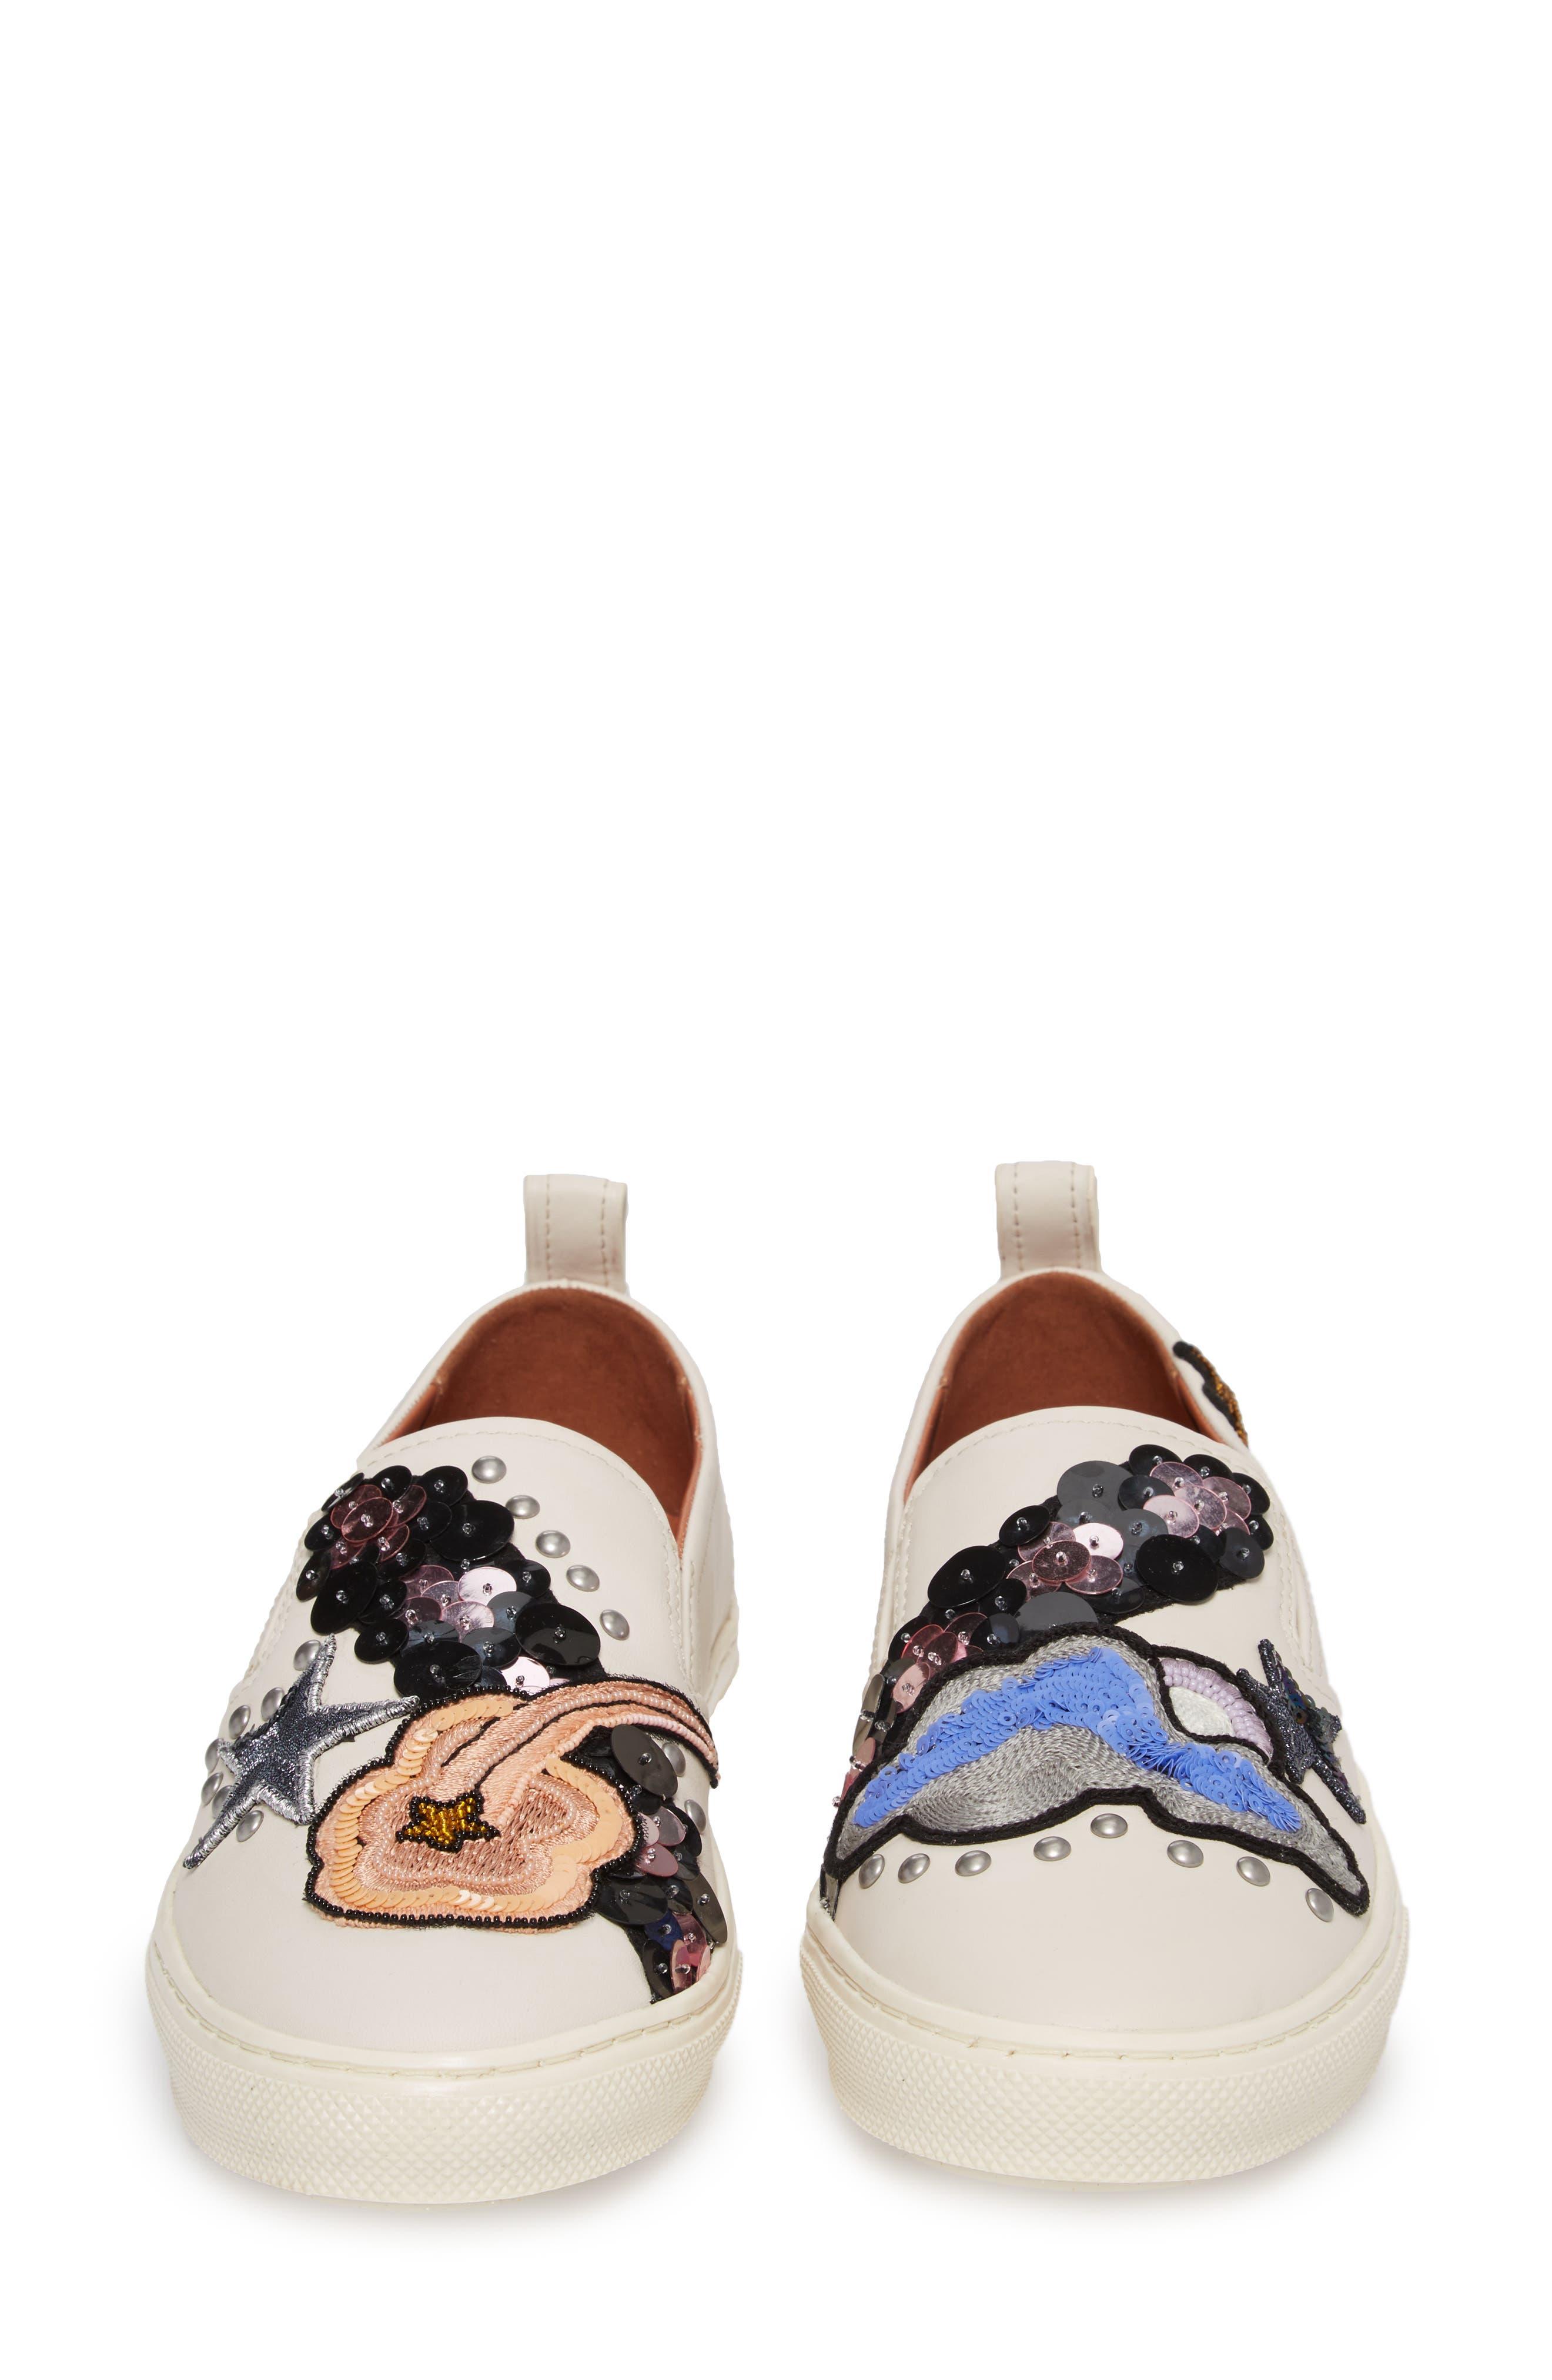 Star Patch Slip-On Sneaker,                             Alternate thumbnail 5, color,                             Chalk Leather